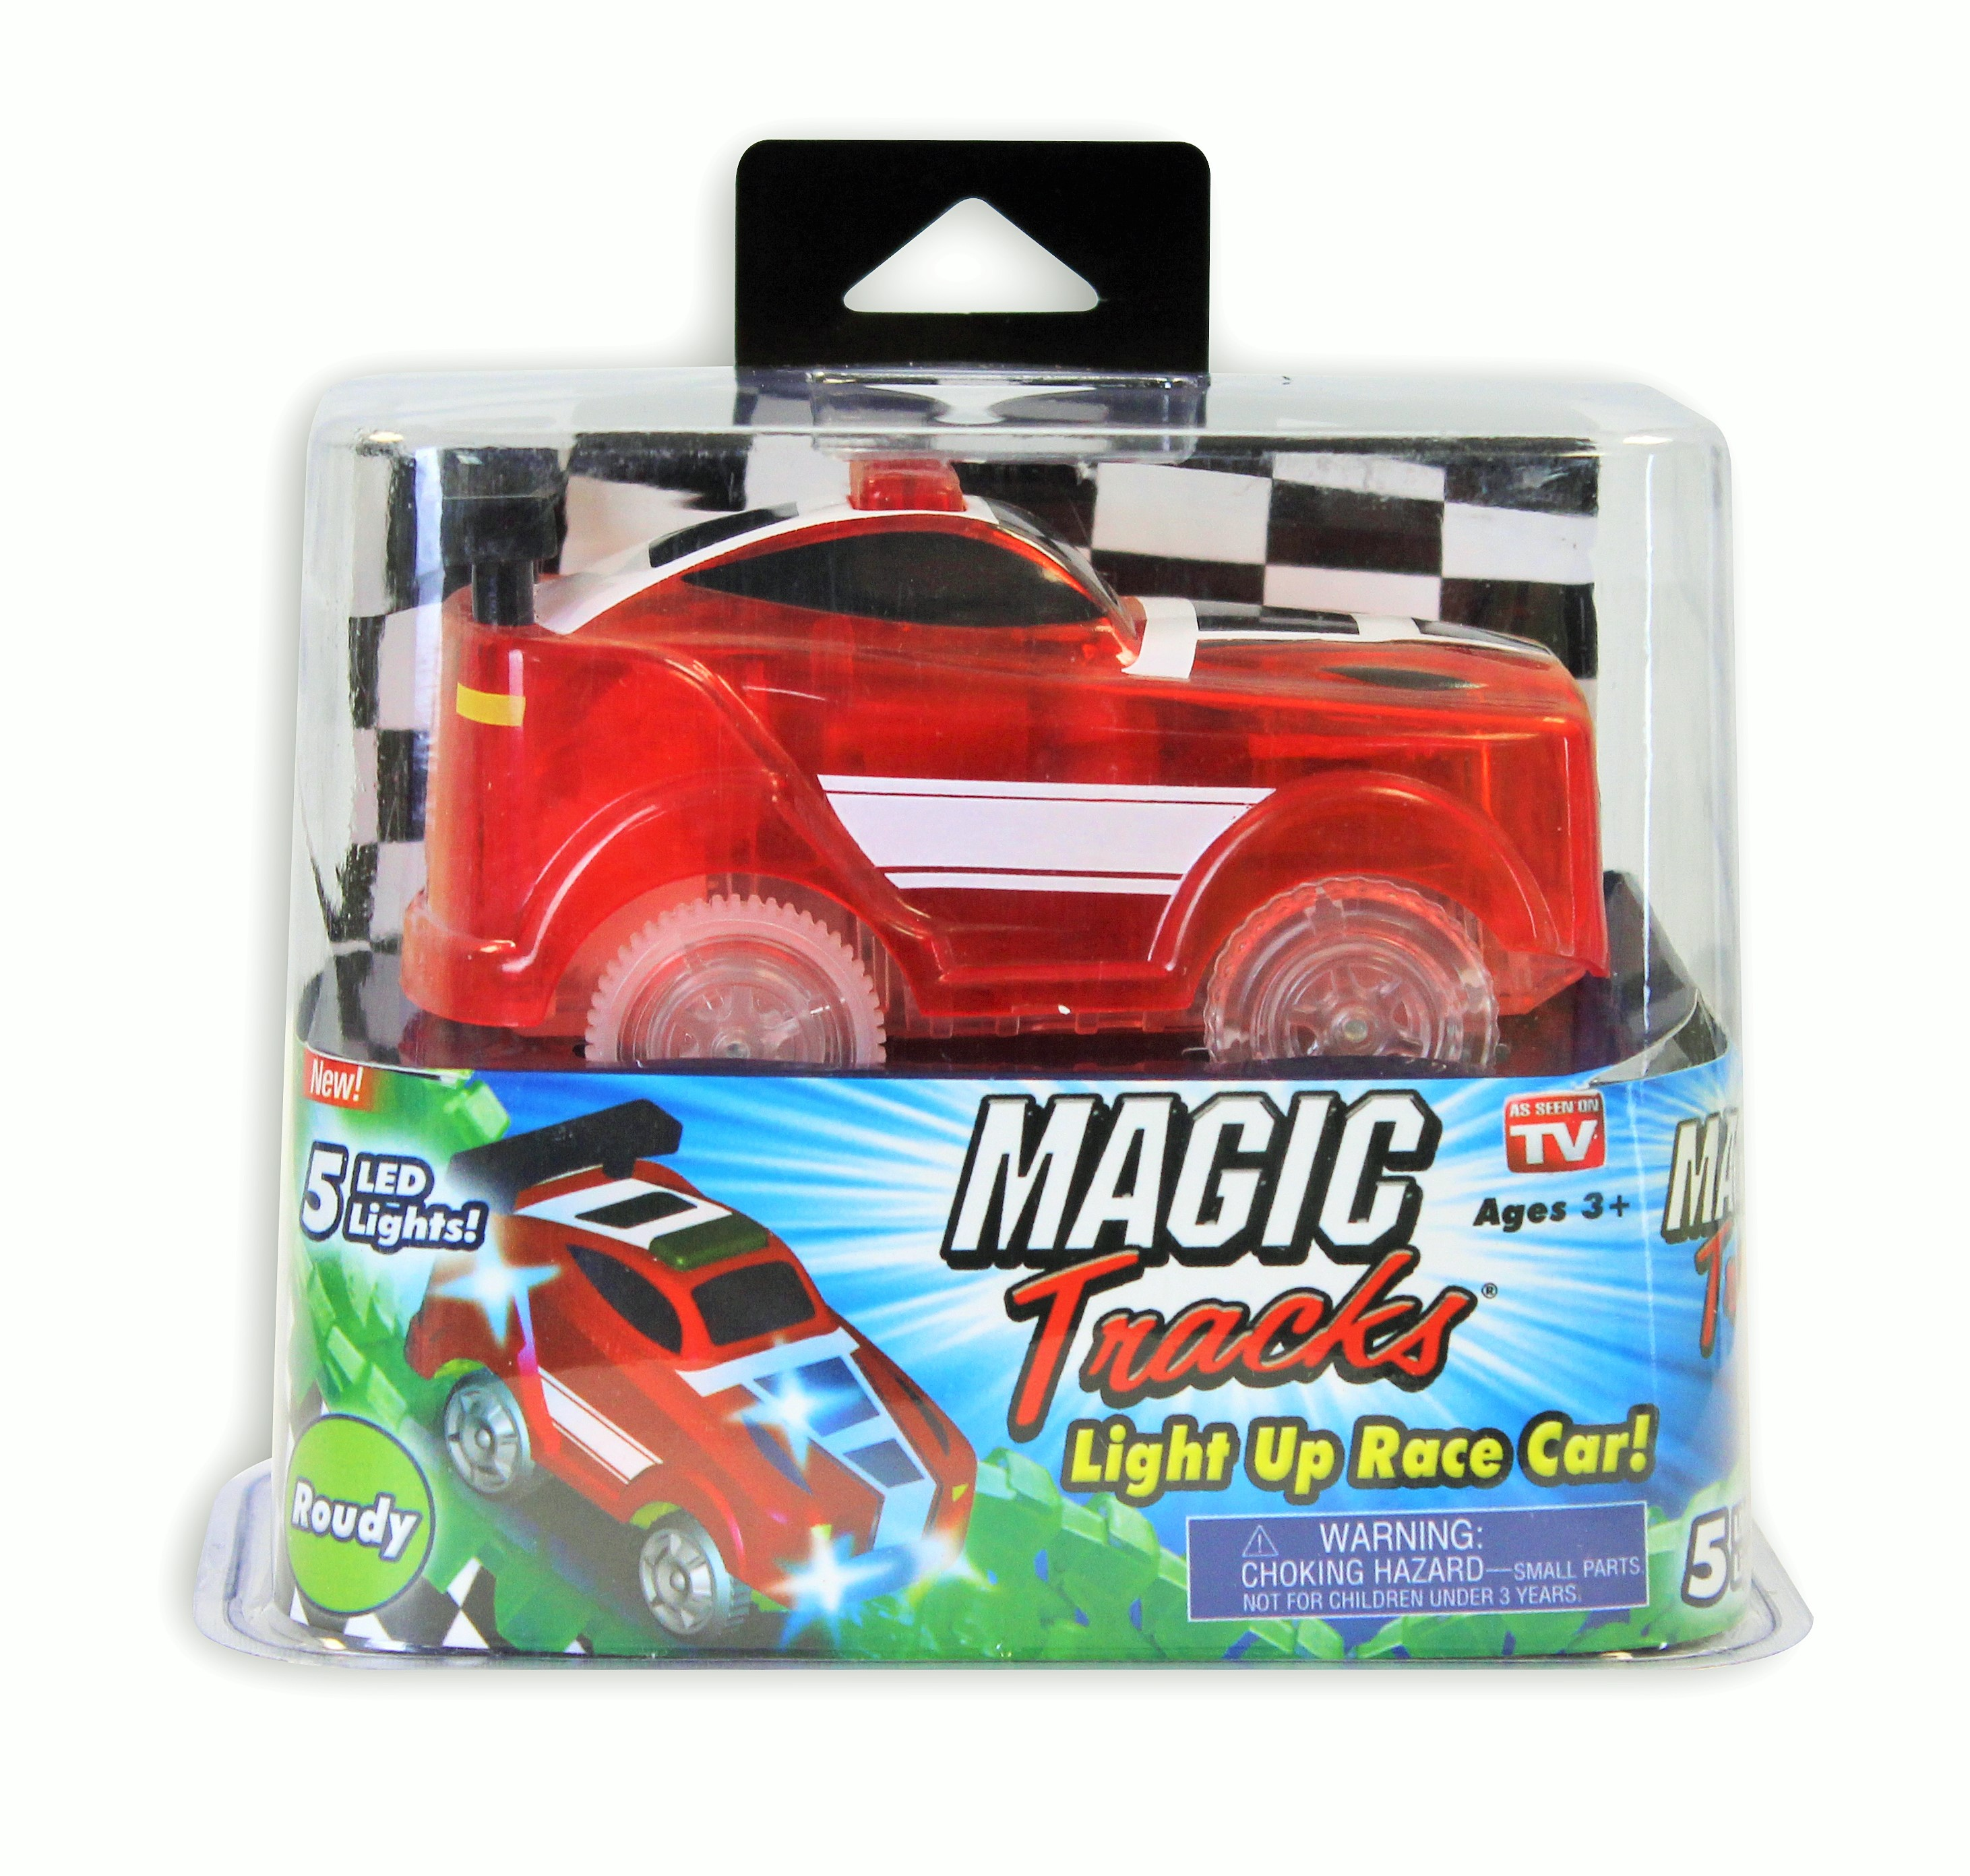 Magic Tracks Light Up Race Car As Seen on TV